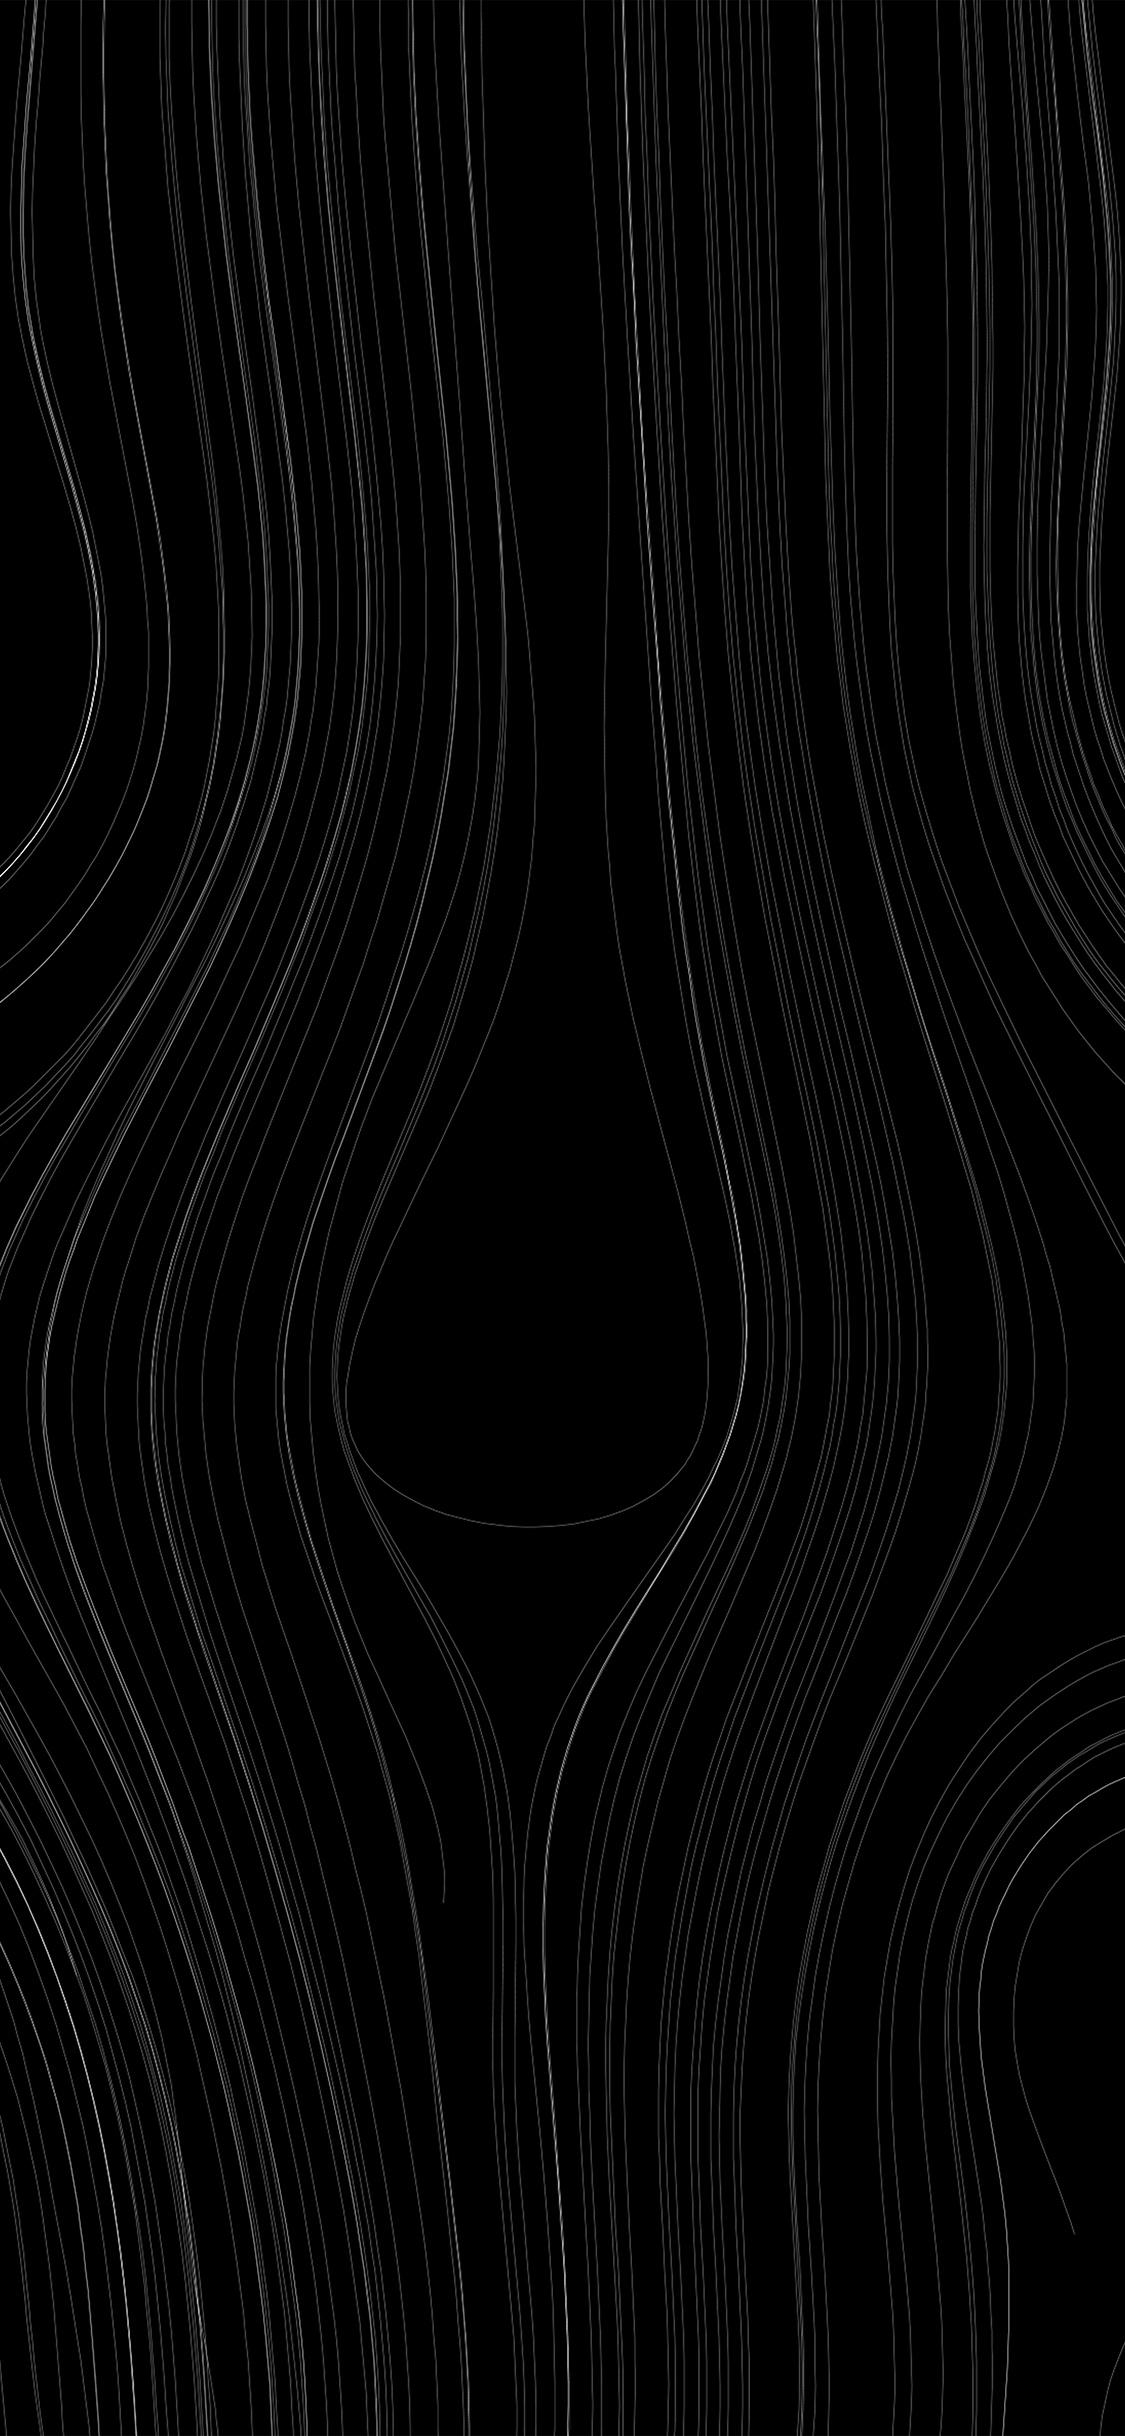 Best Dark Iphone X Wallpapers Hd Ilikewallpaper